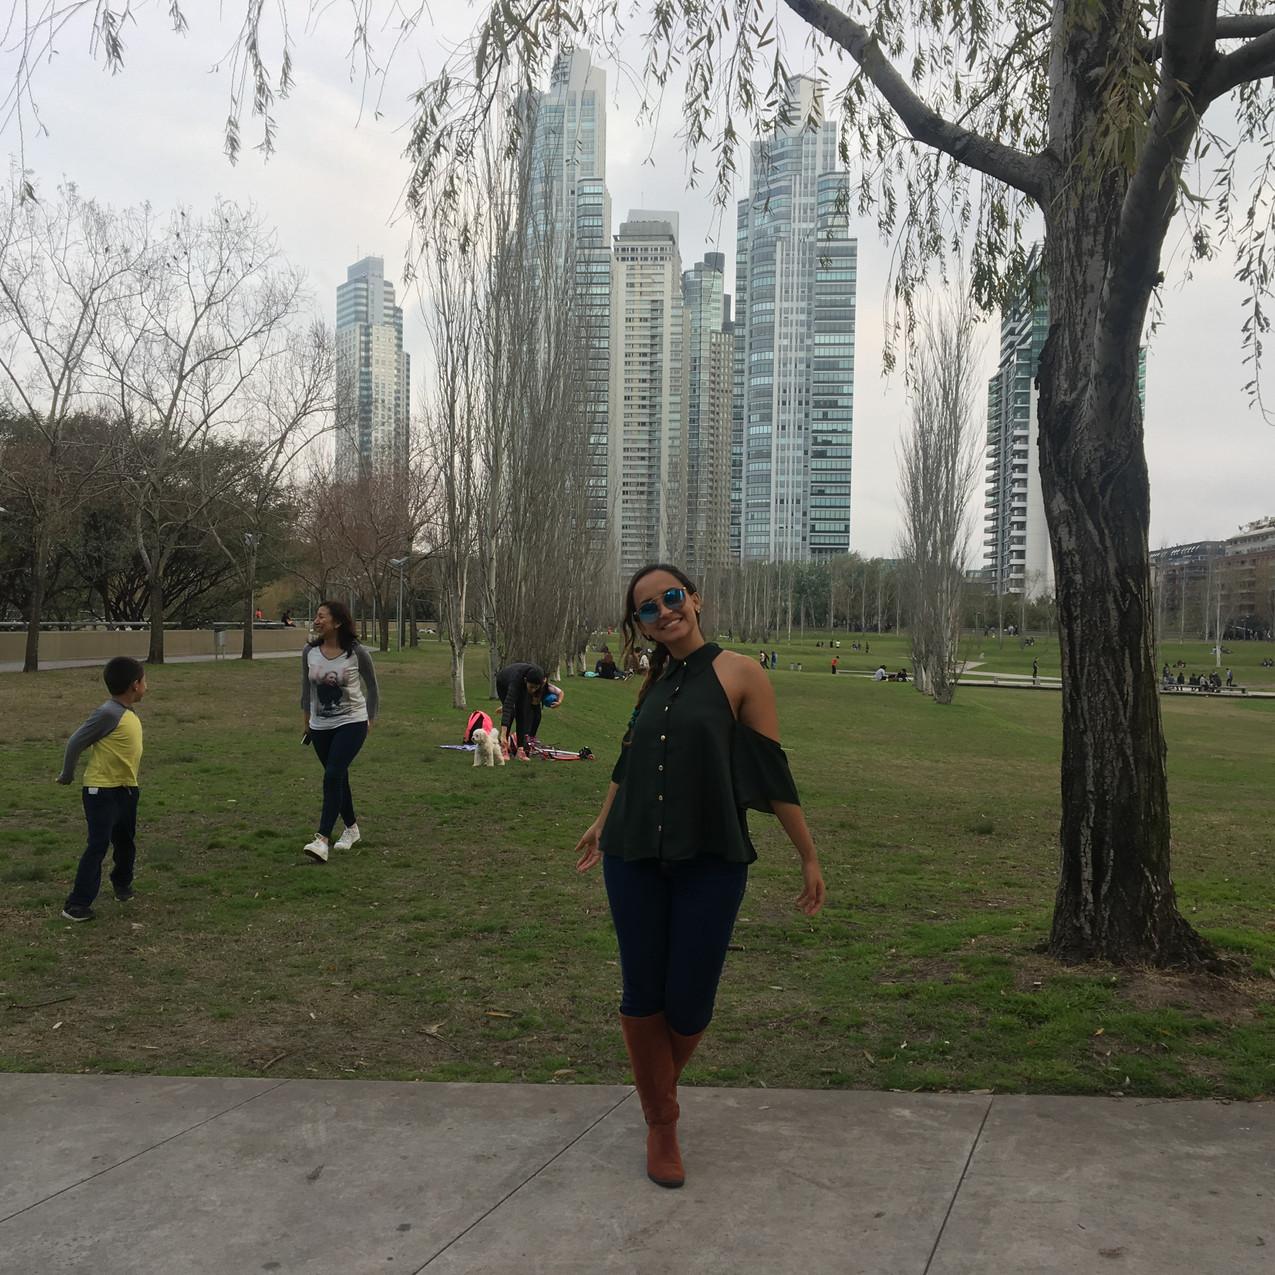 Parque Mujeres Argentinas em Buenos Aires